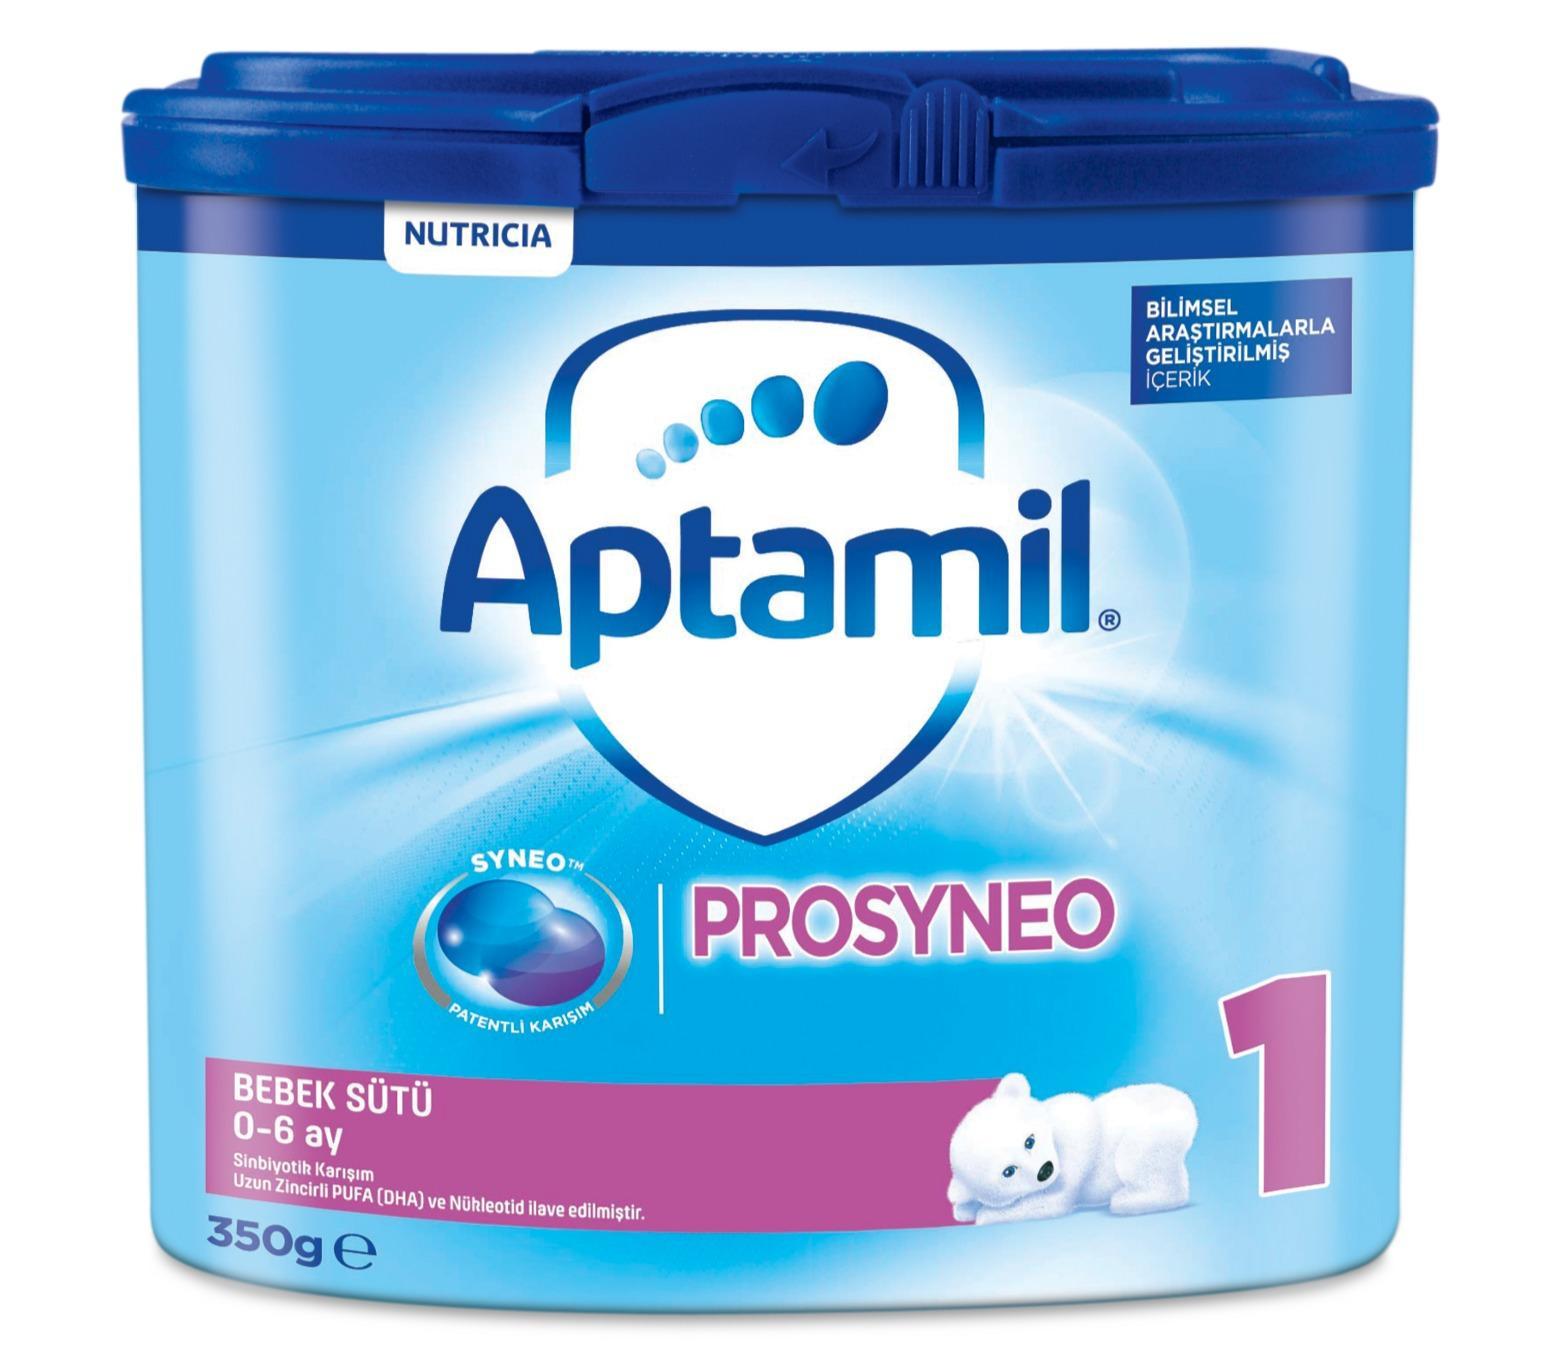 Aptamil Prosyneo 1 numara Bebek Sütü skt:09/2020